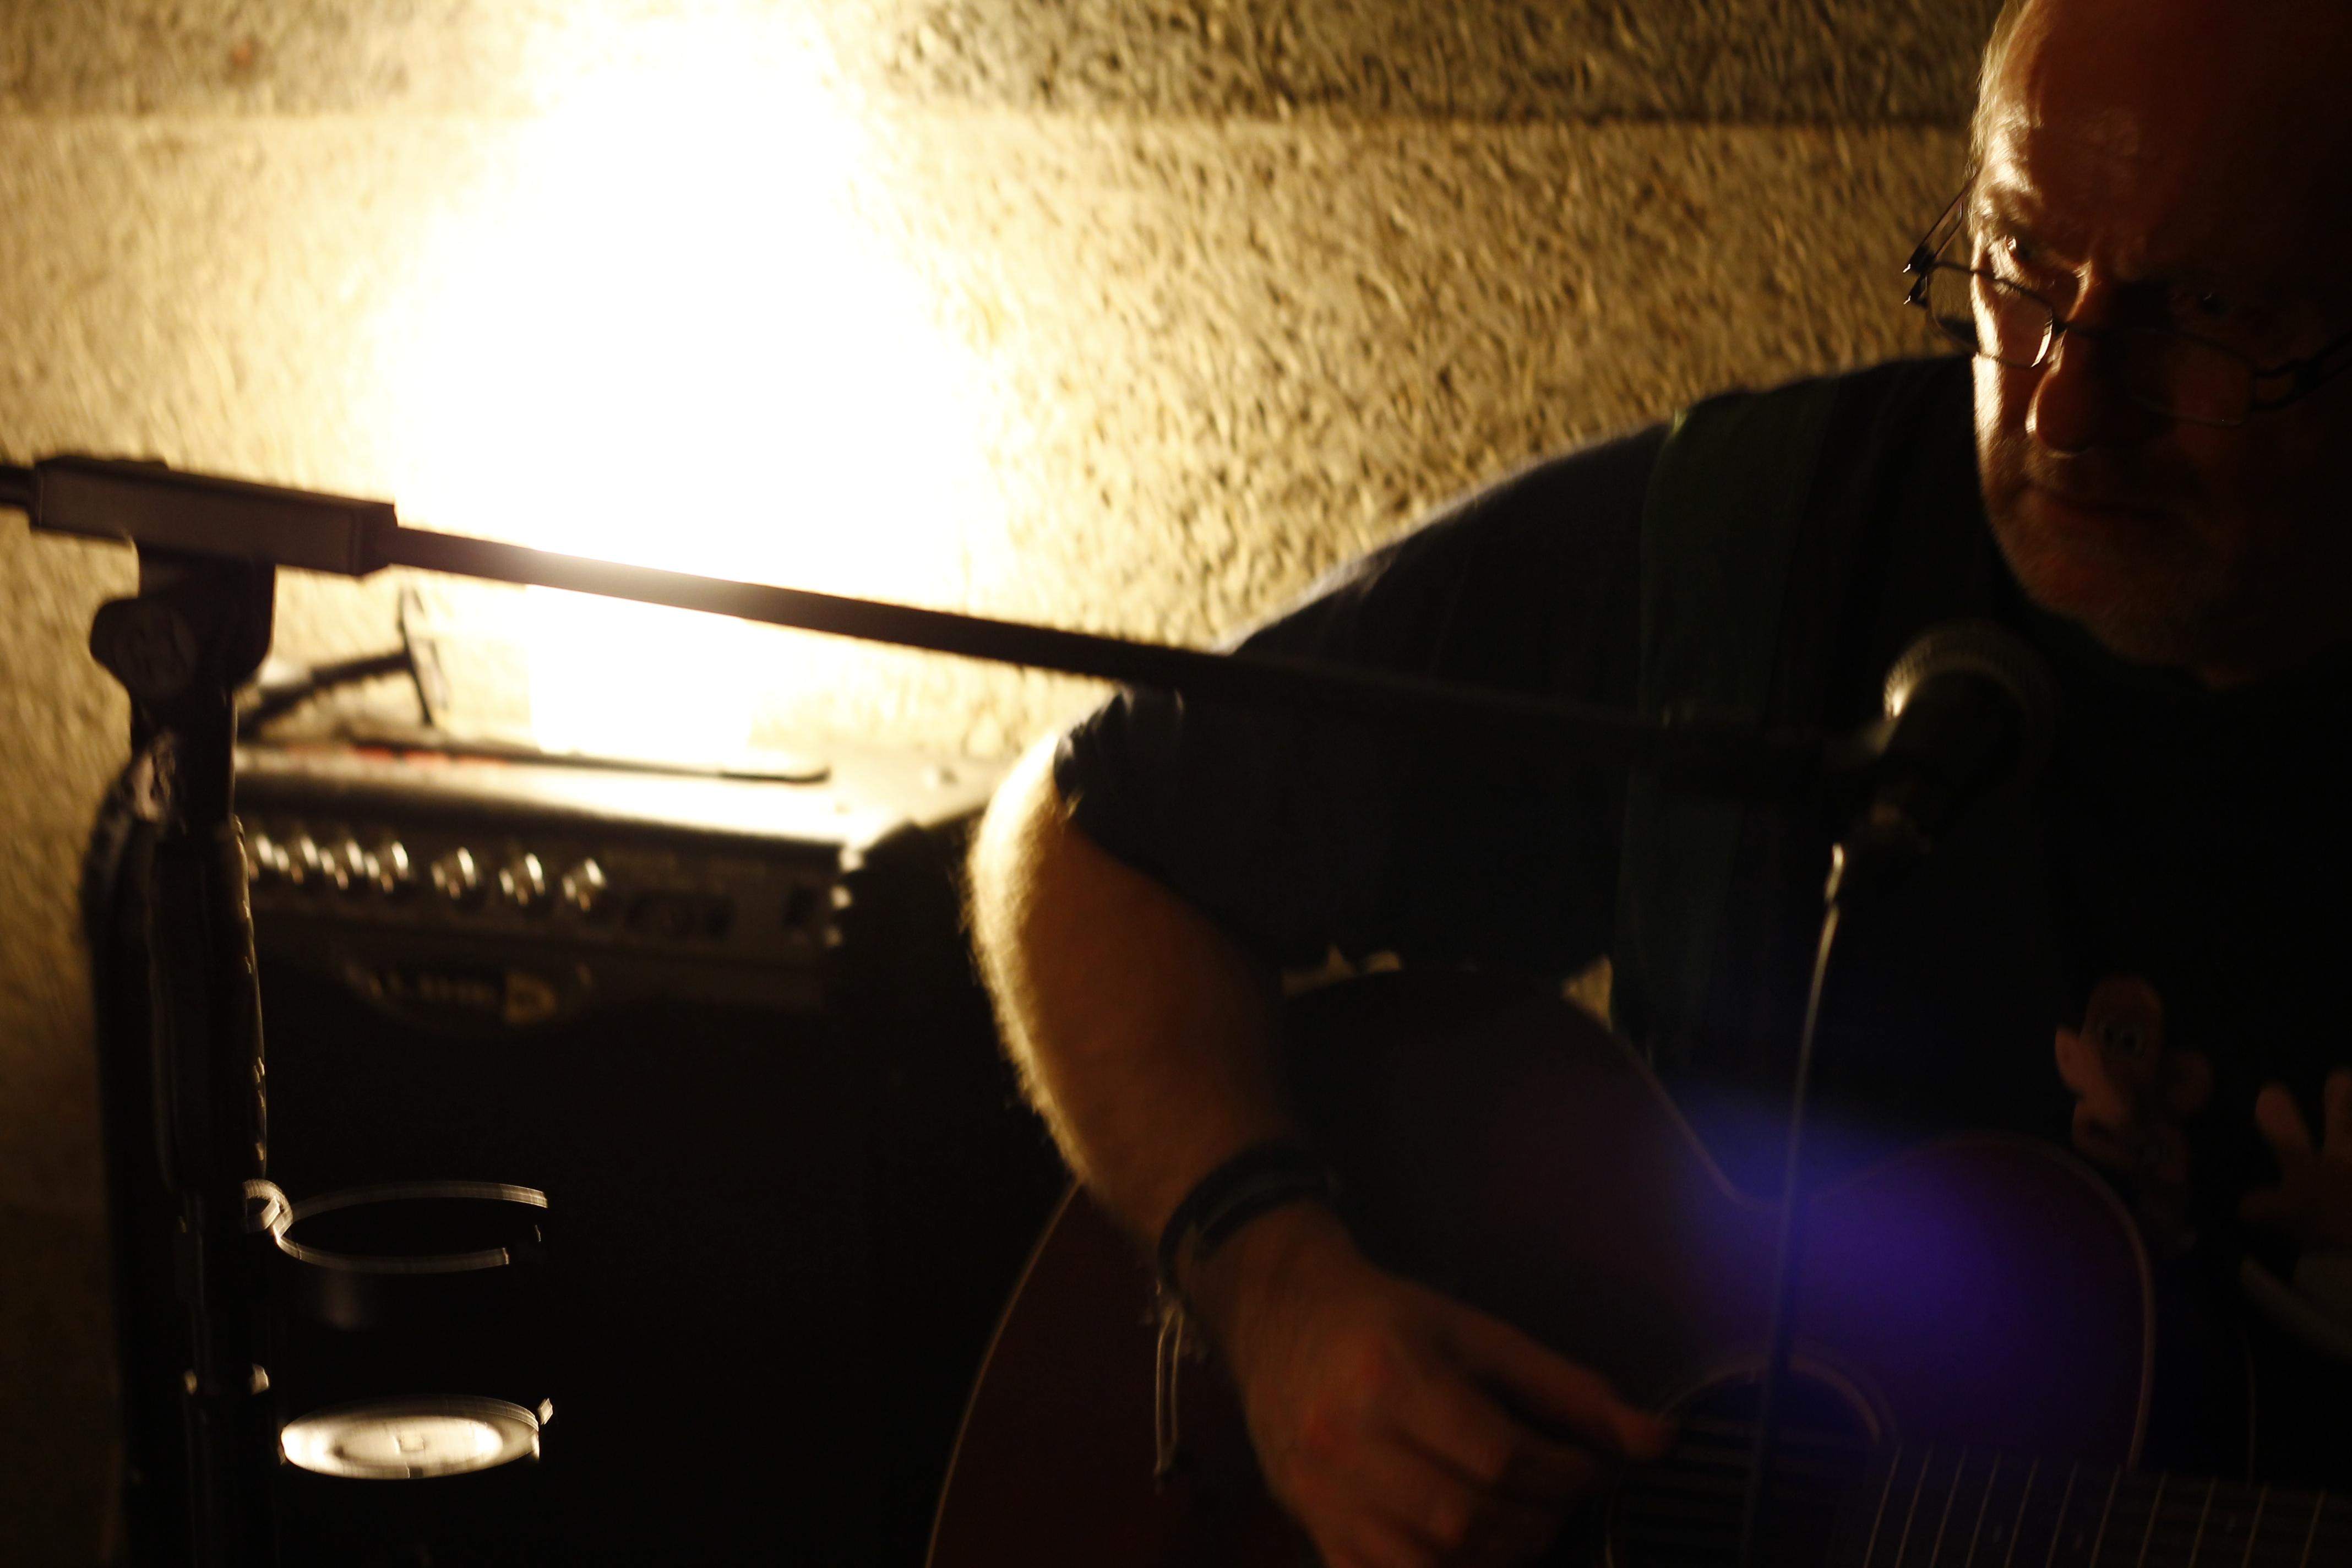 More soft lighting